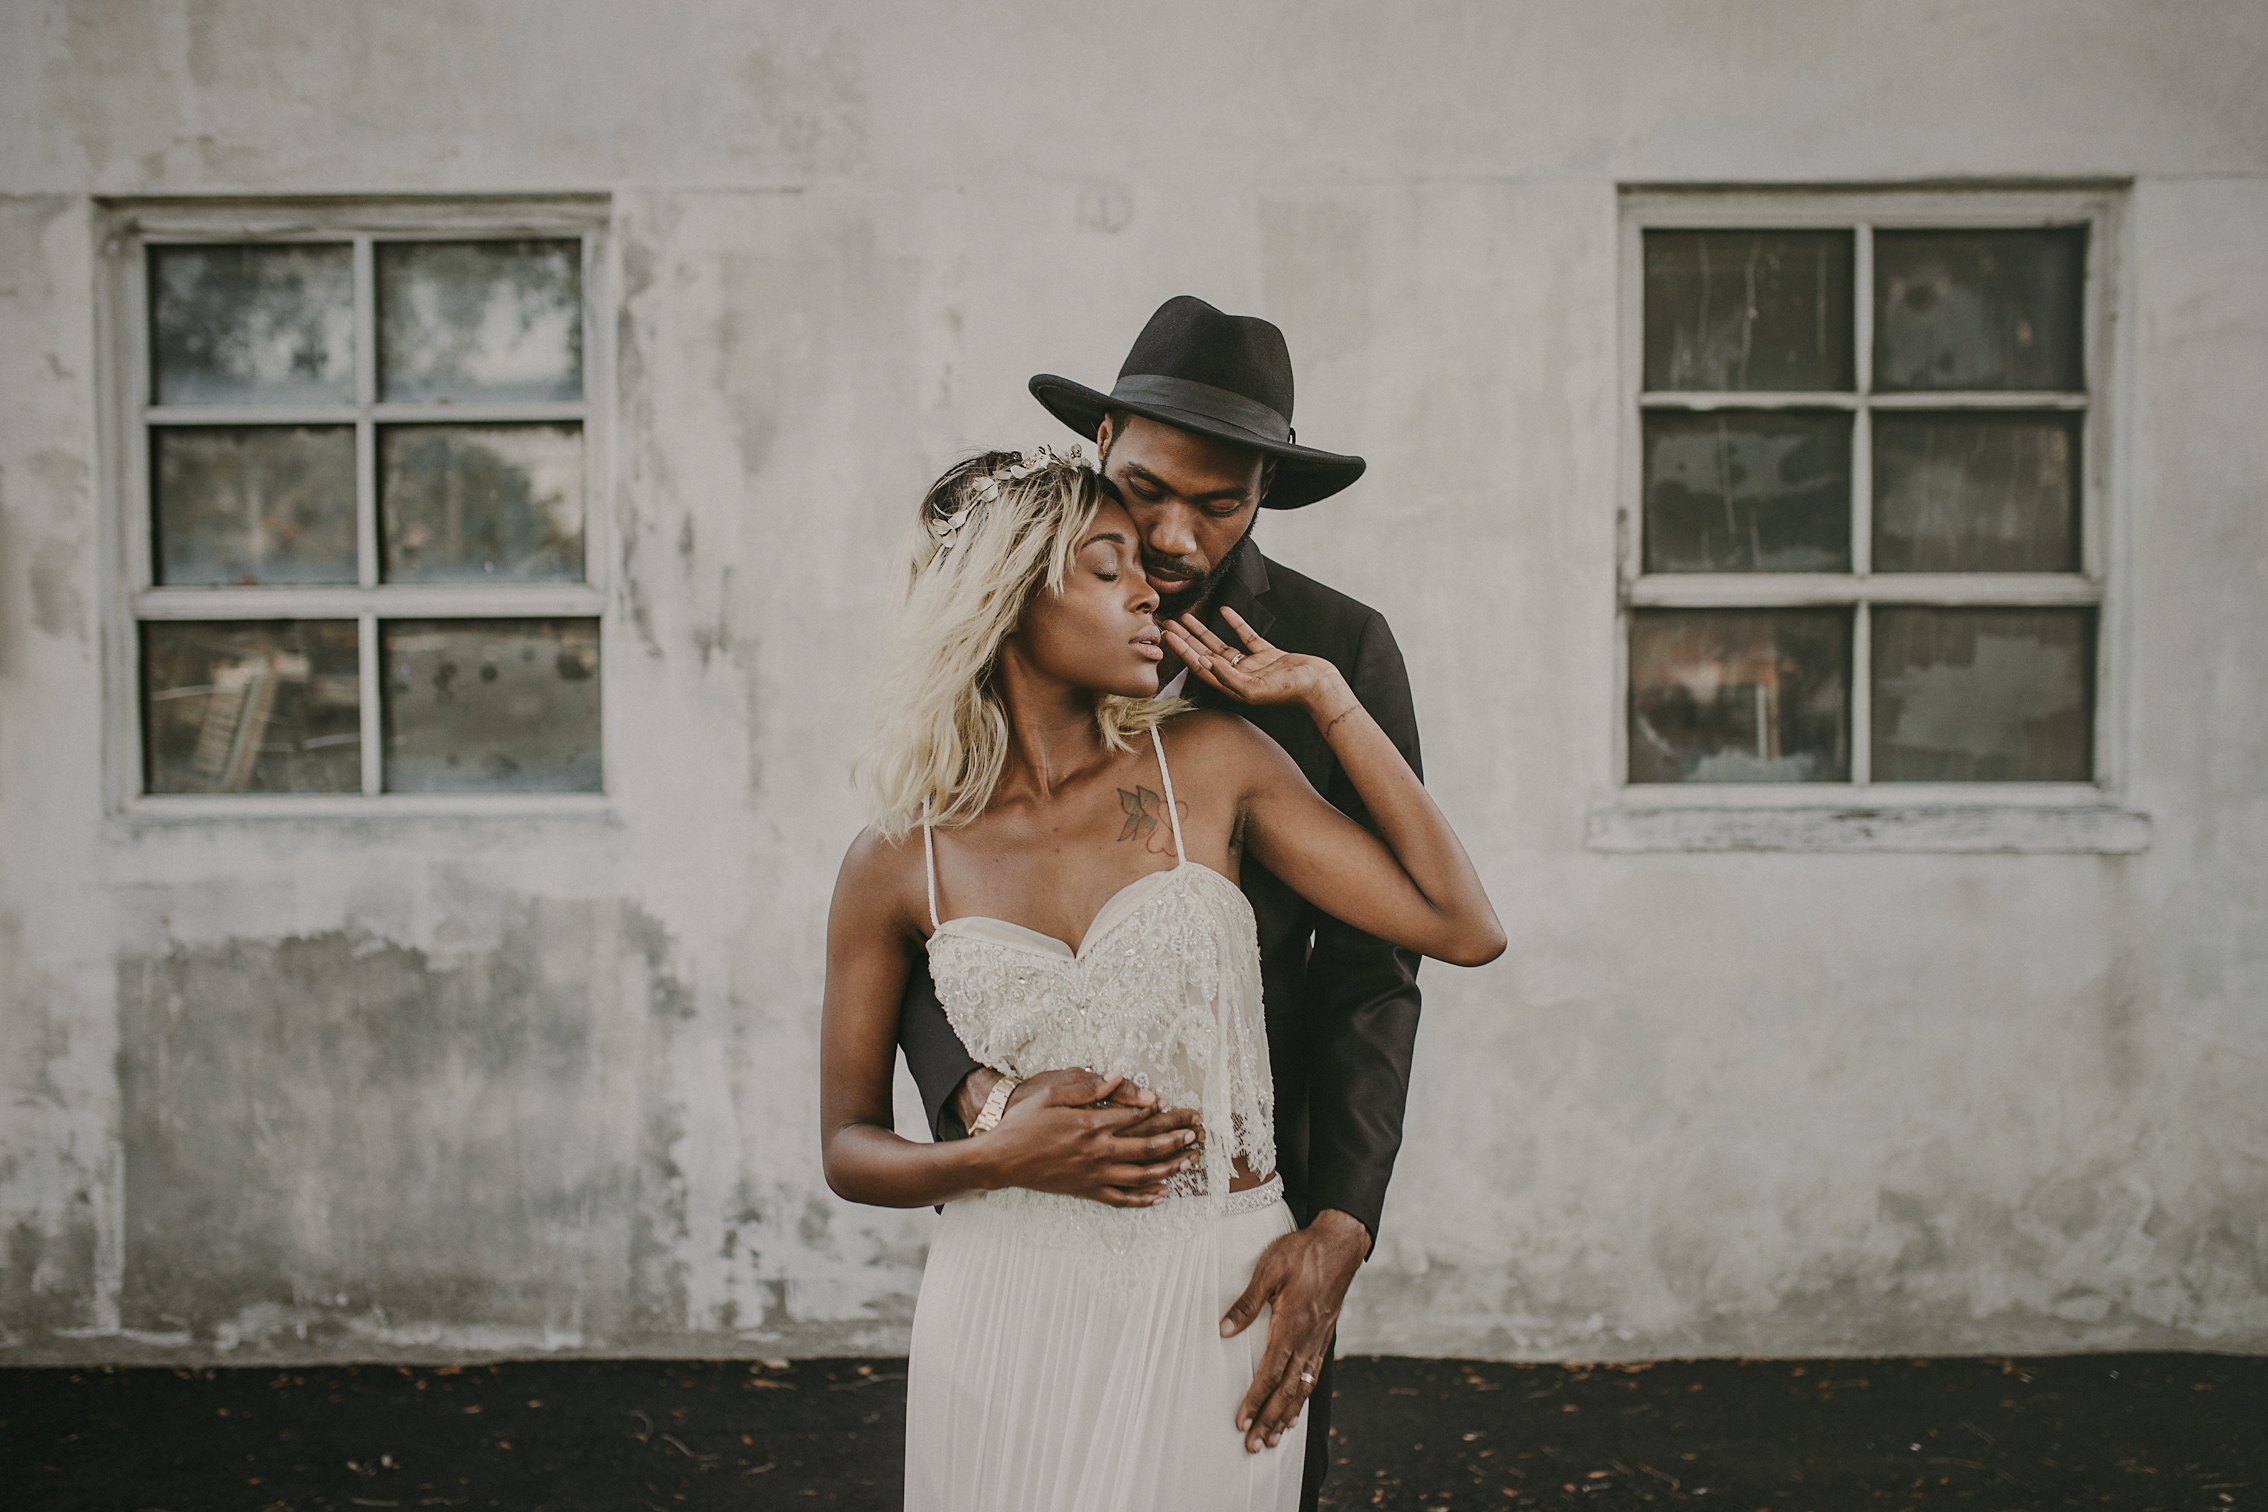 Pablo Laguia wedding photographer-1-4.jpg